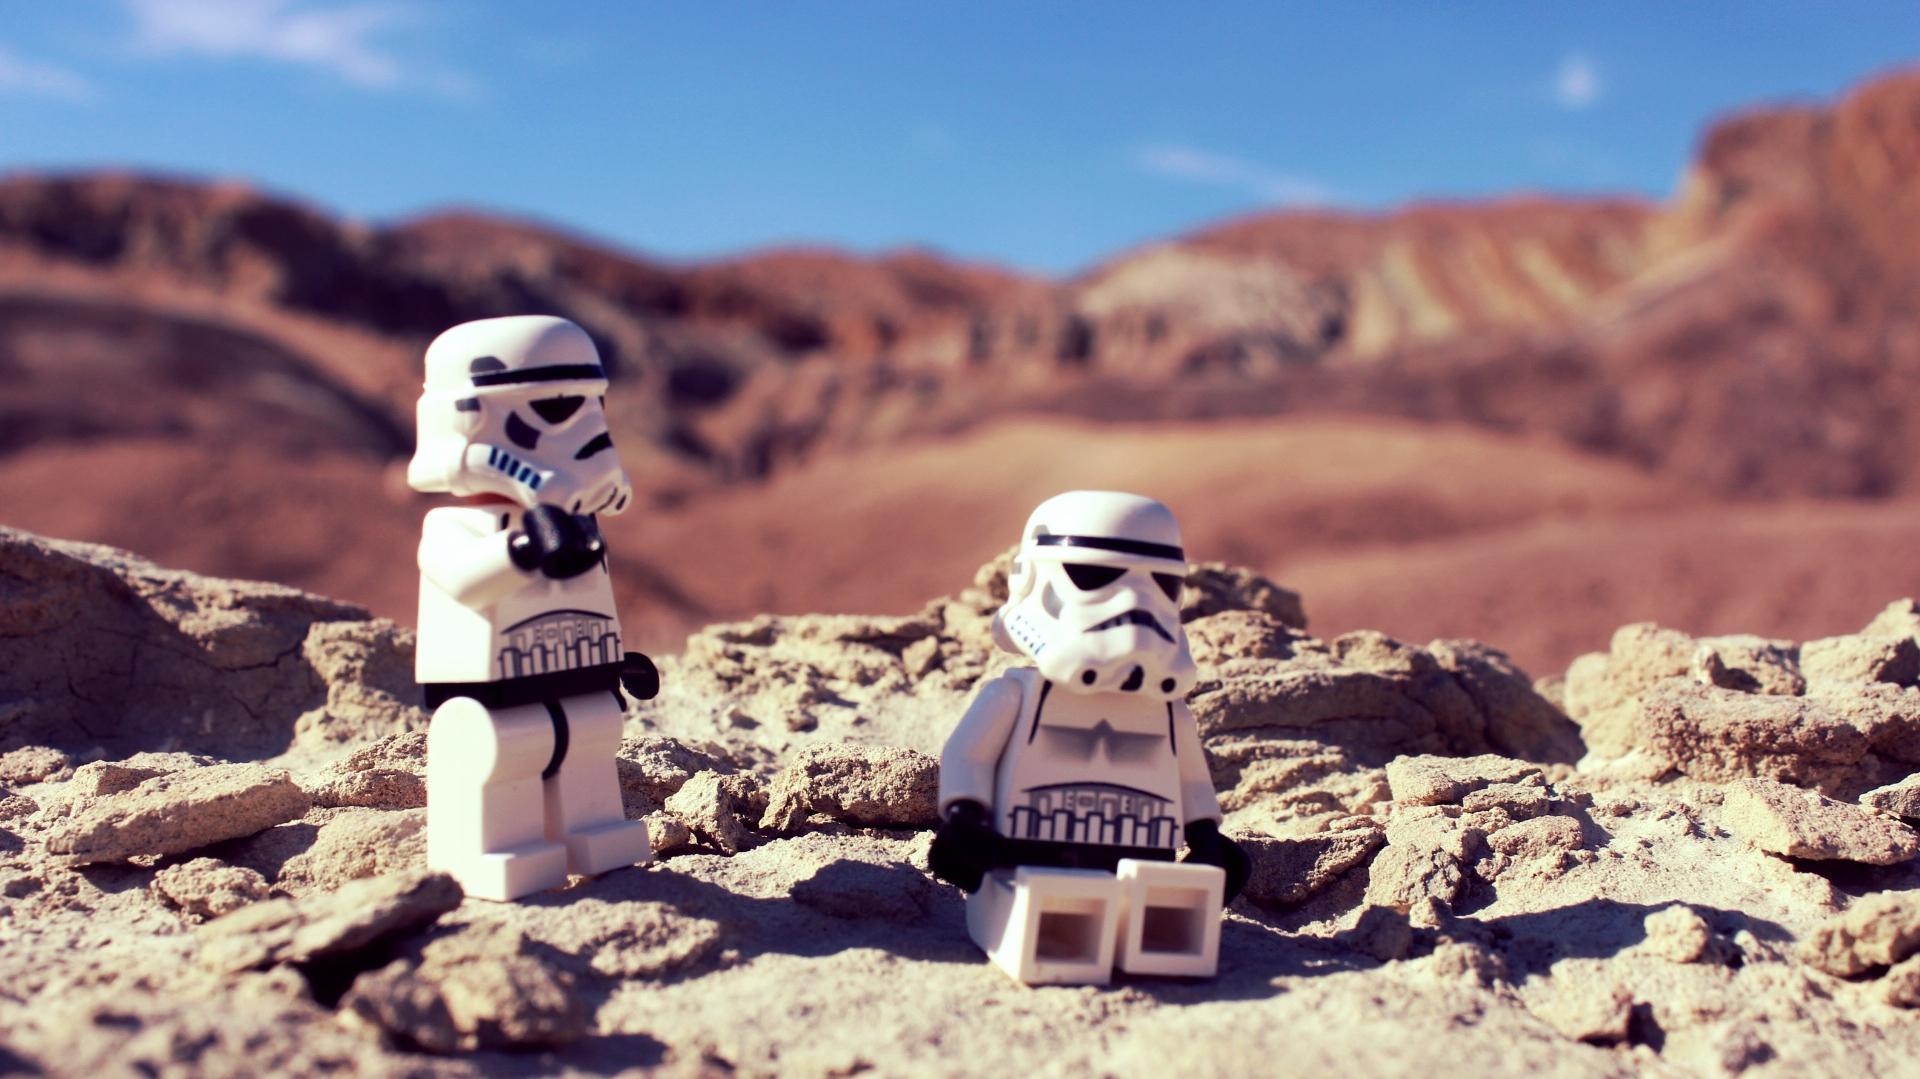 Wallpaper Star Lego Stormtrooper Wars Minifig Tatooine Rainbowbasin Legography 1920x1079 1086480 Hd Wallpapers Wallhere